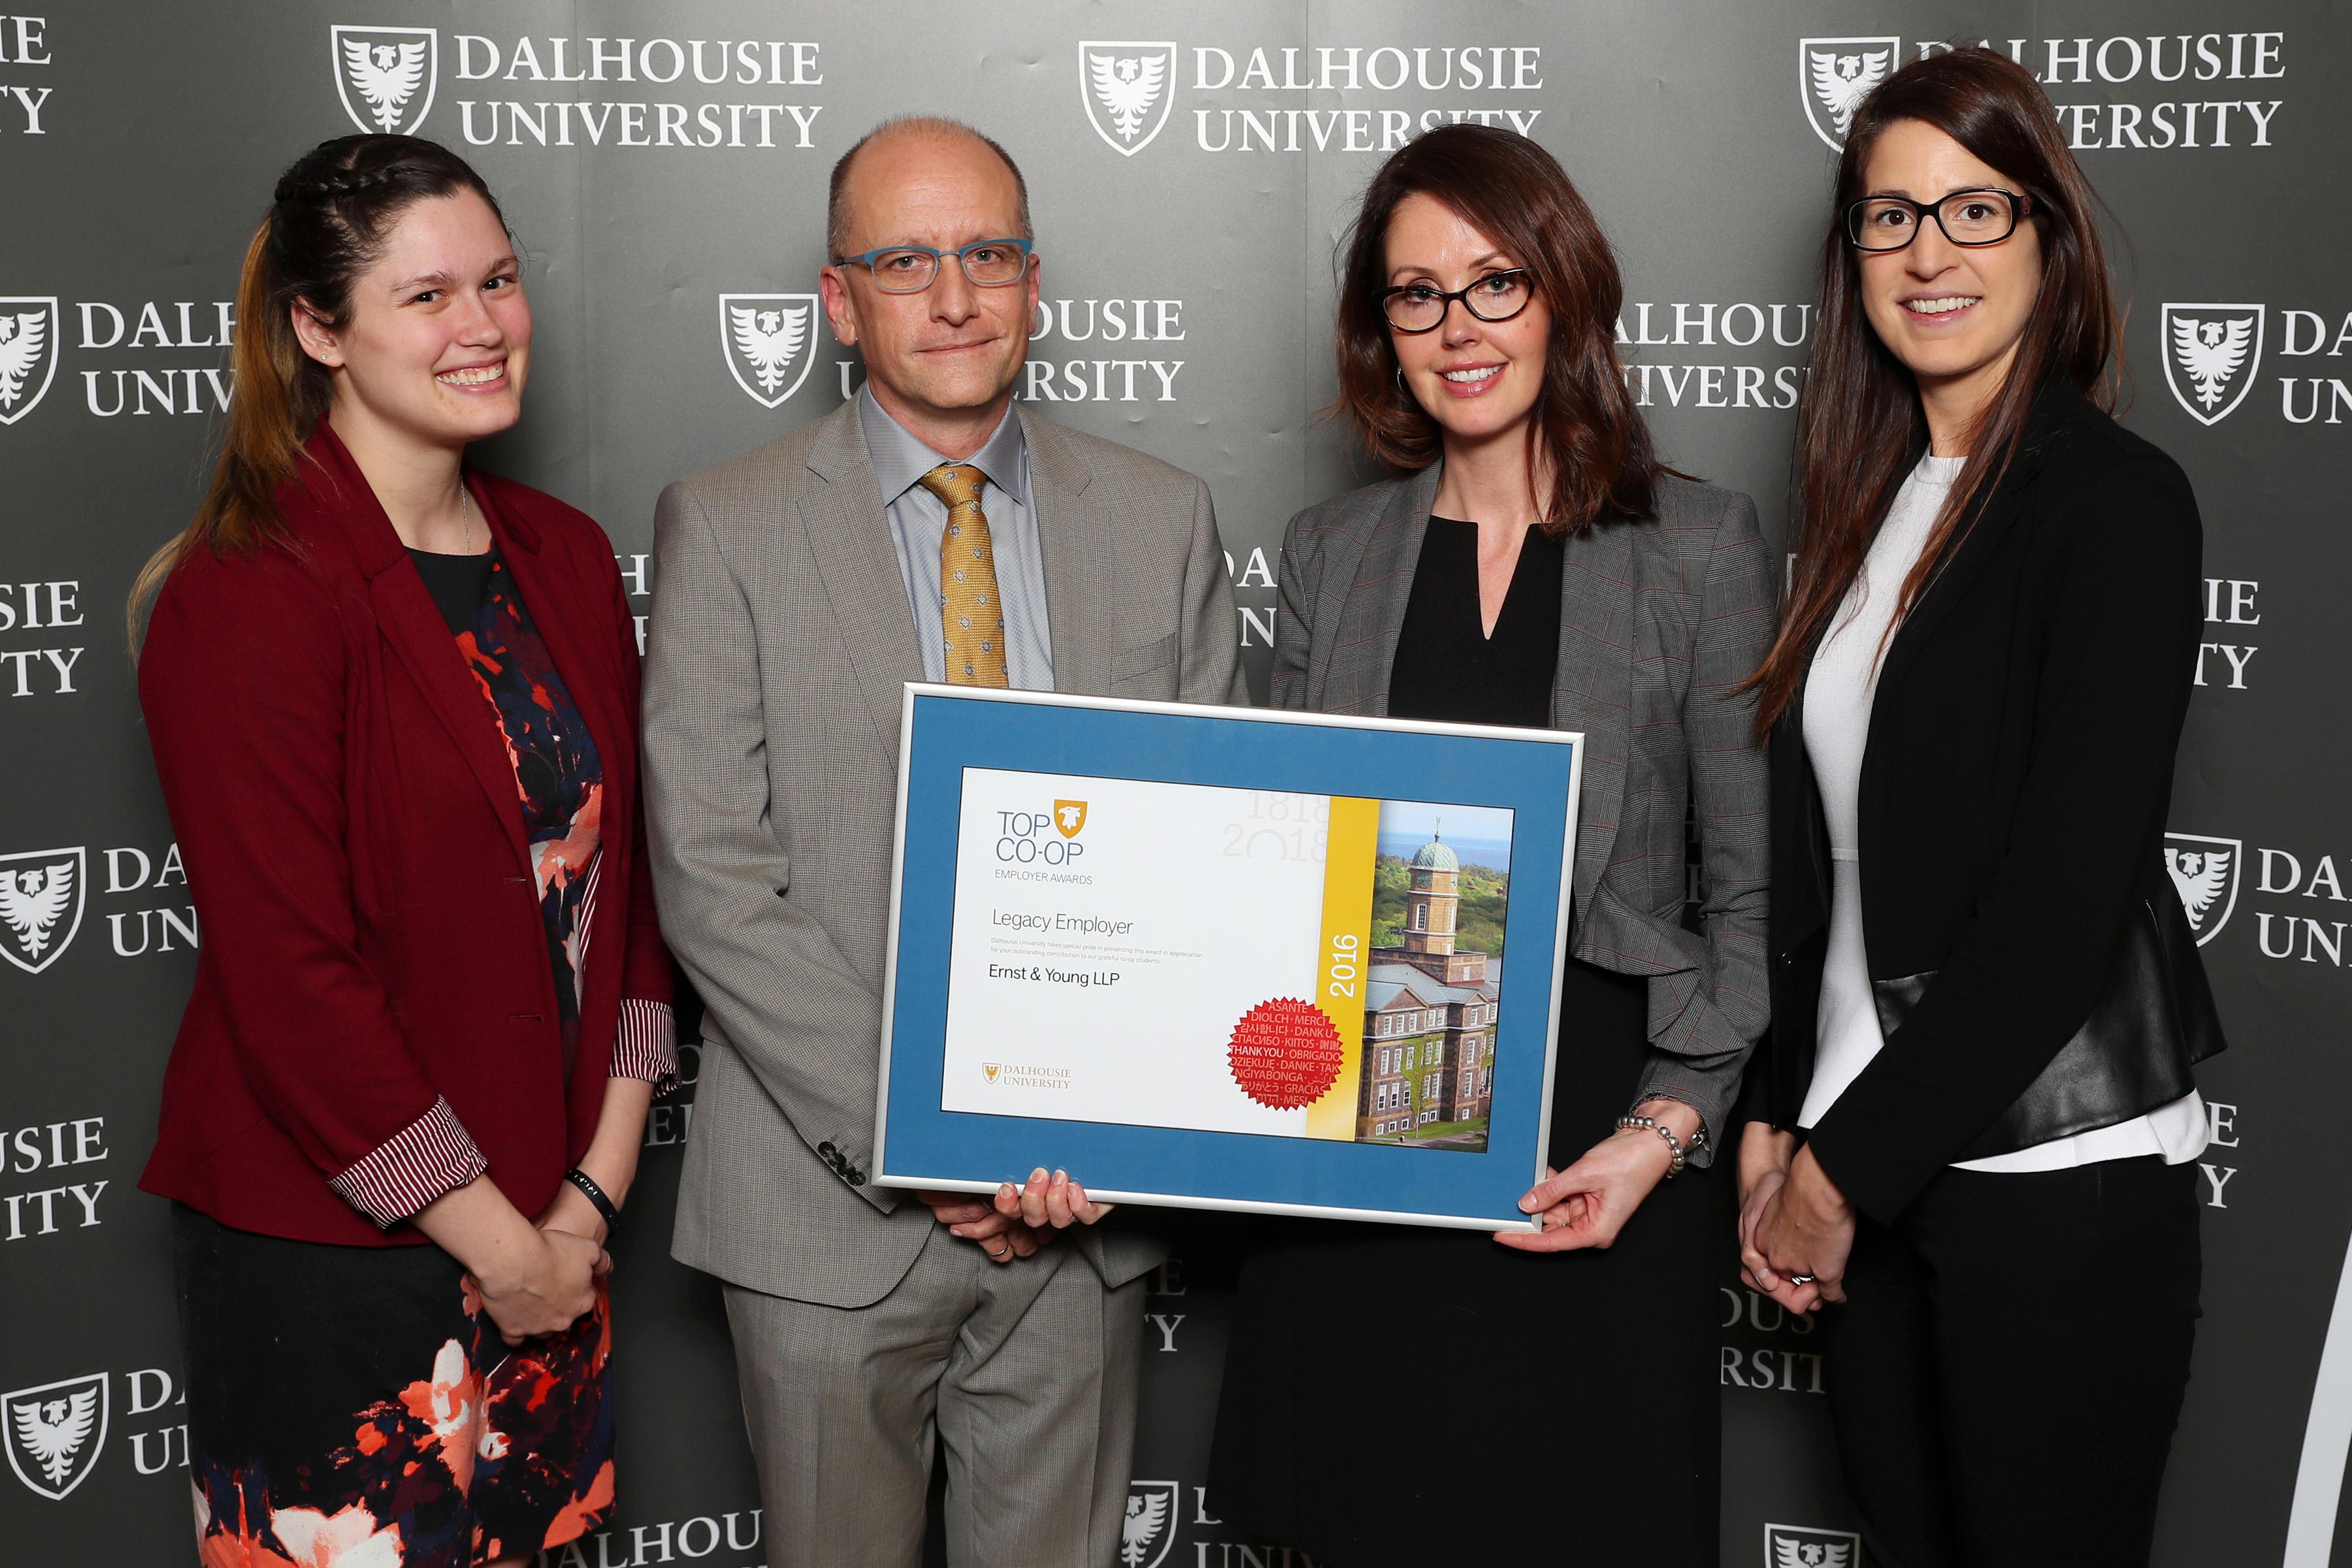 Dalhousie University celebrates excellence in co-operative education